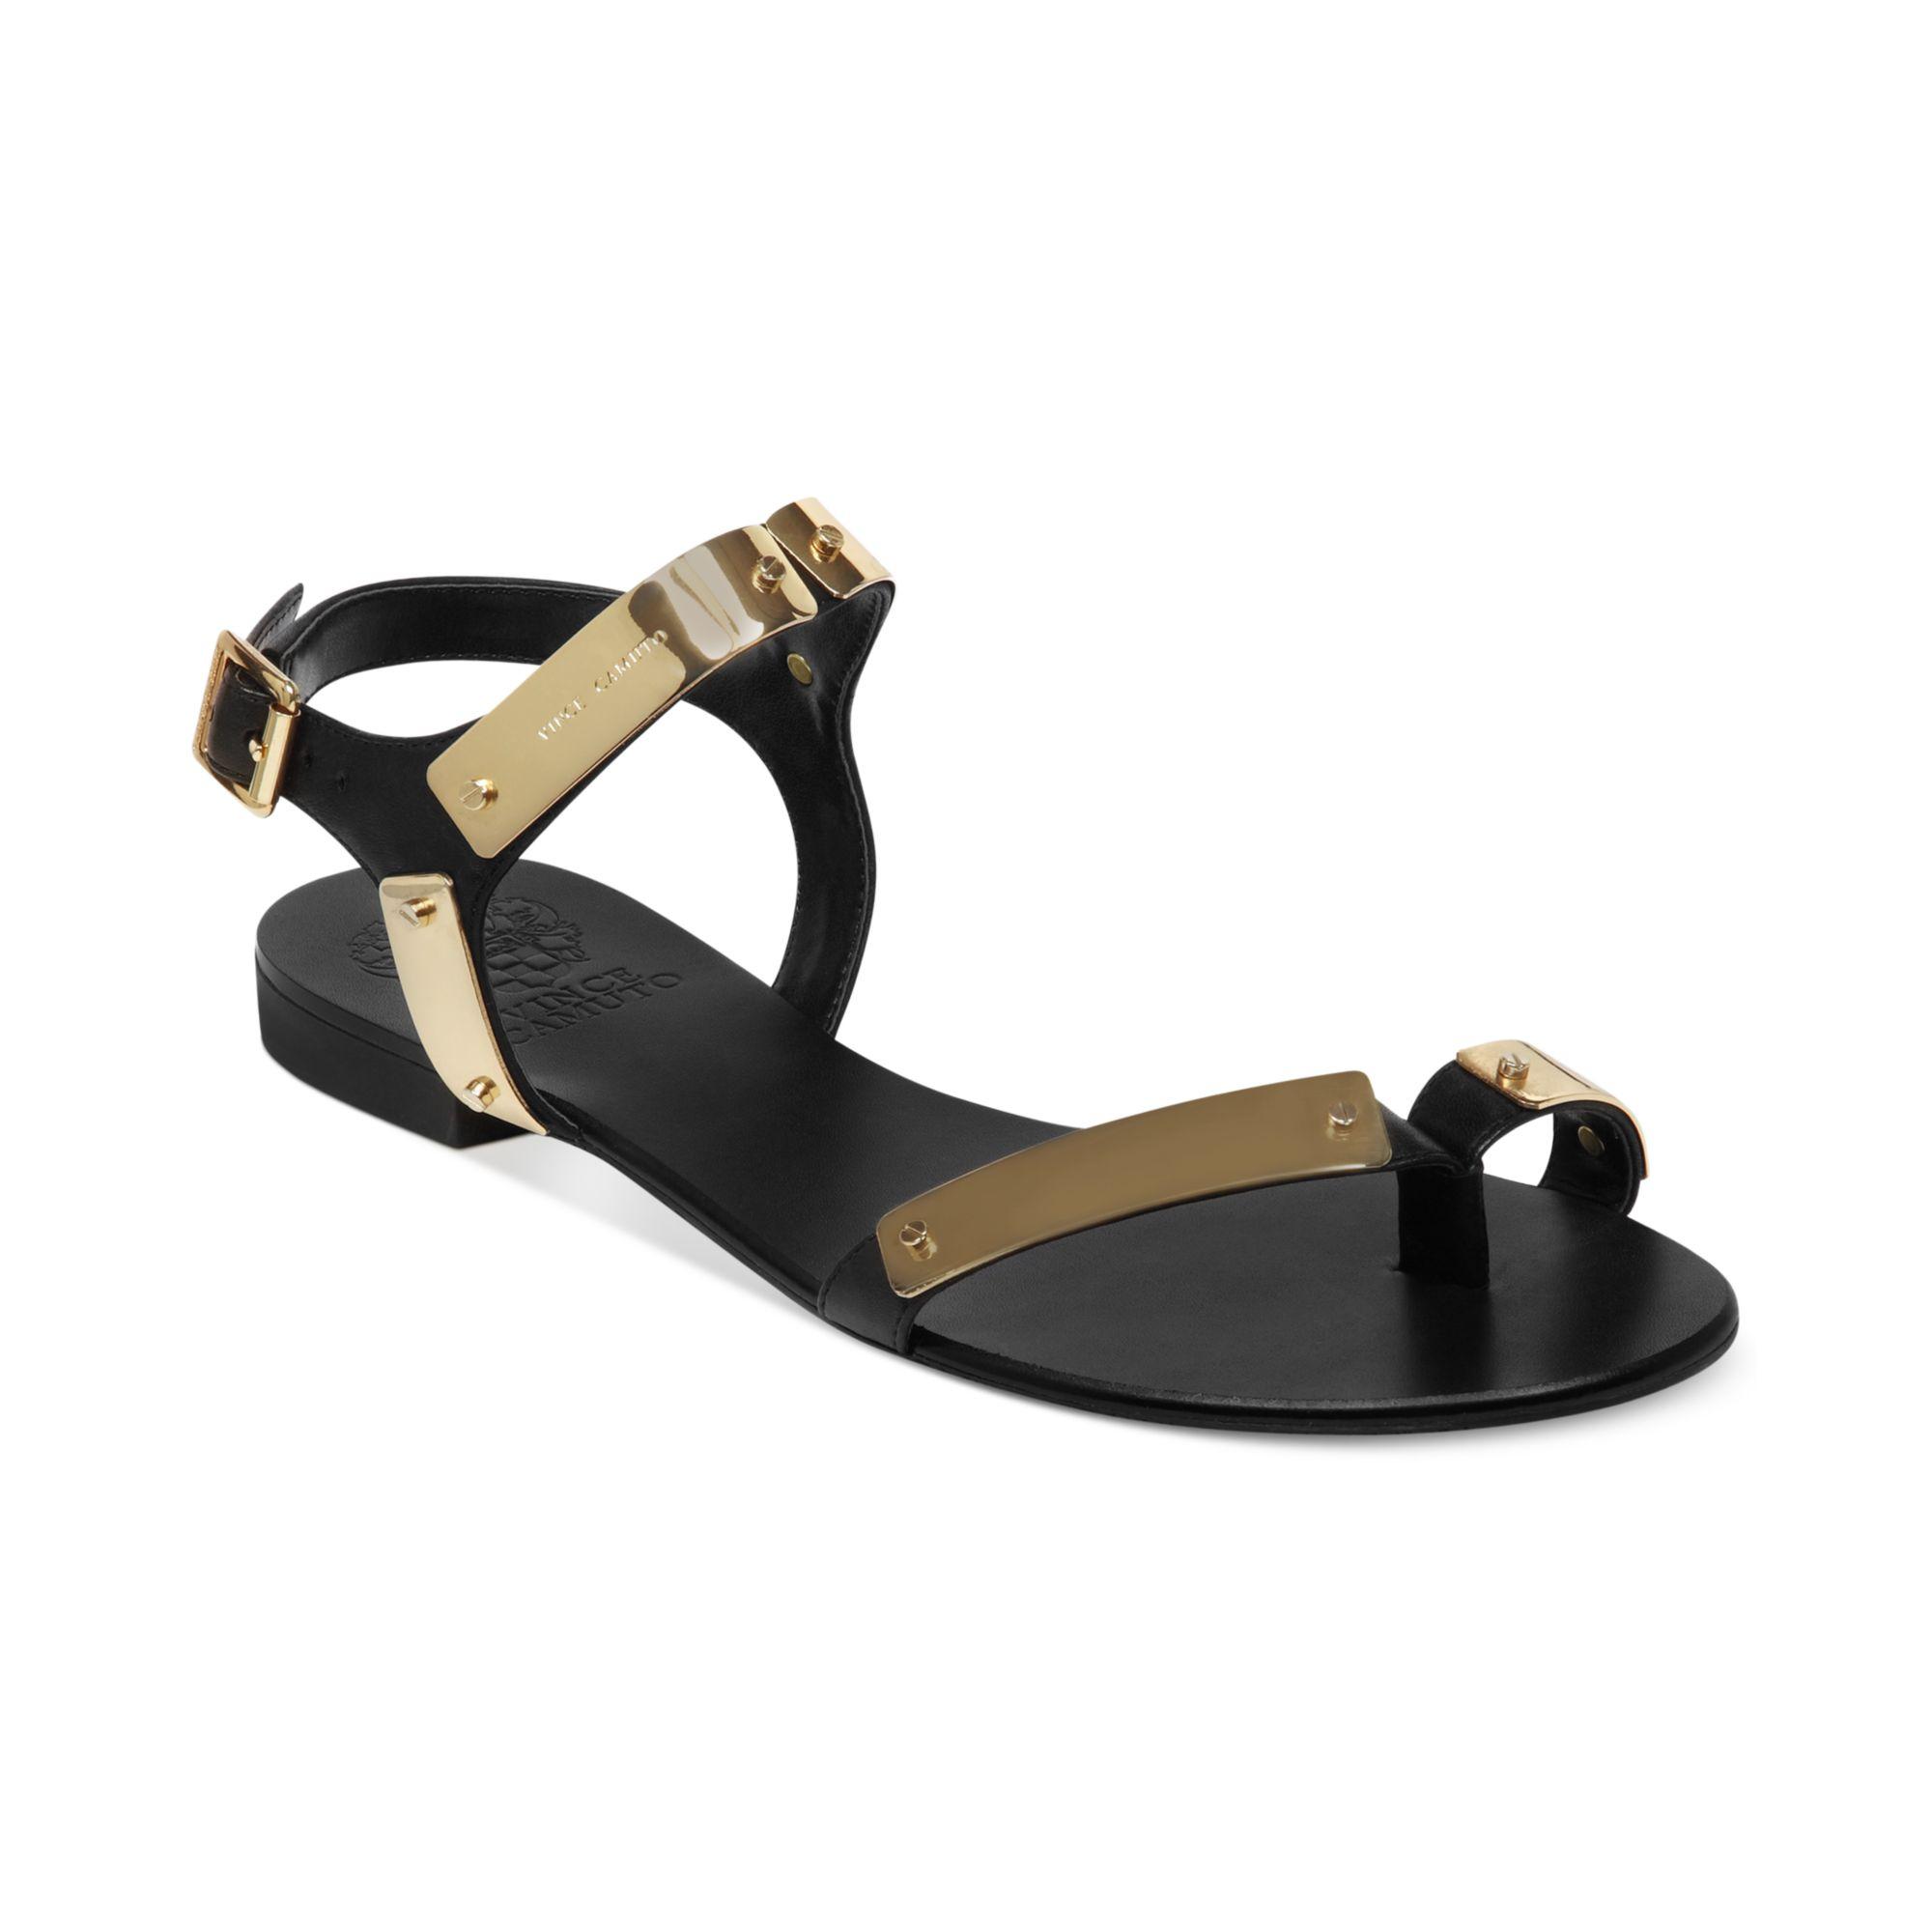 3c6731a89503 Lyst - Vince Camuto Joslyn Flat Sandals in Metallic